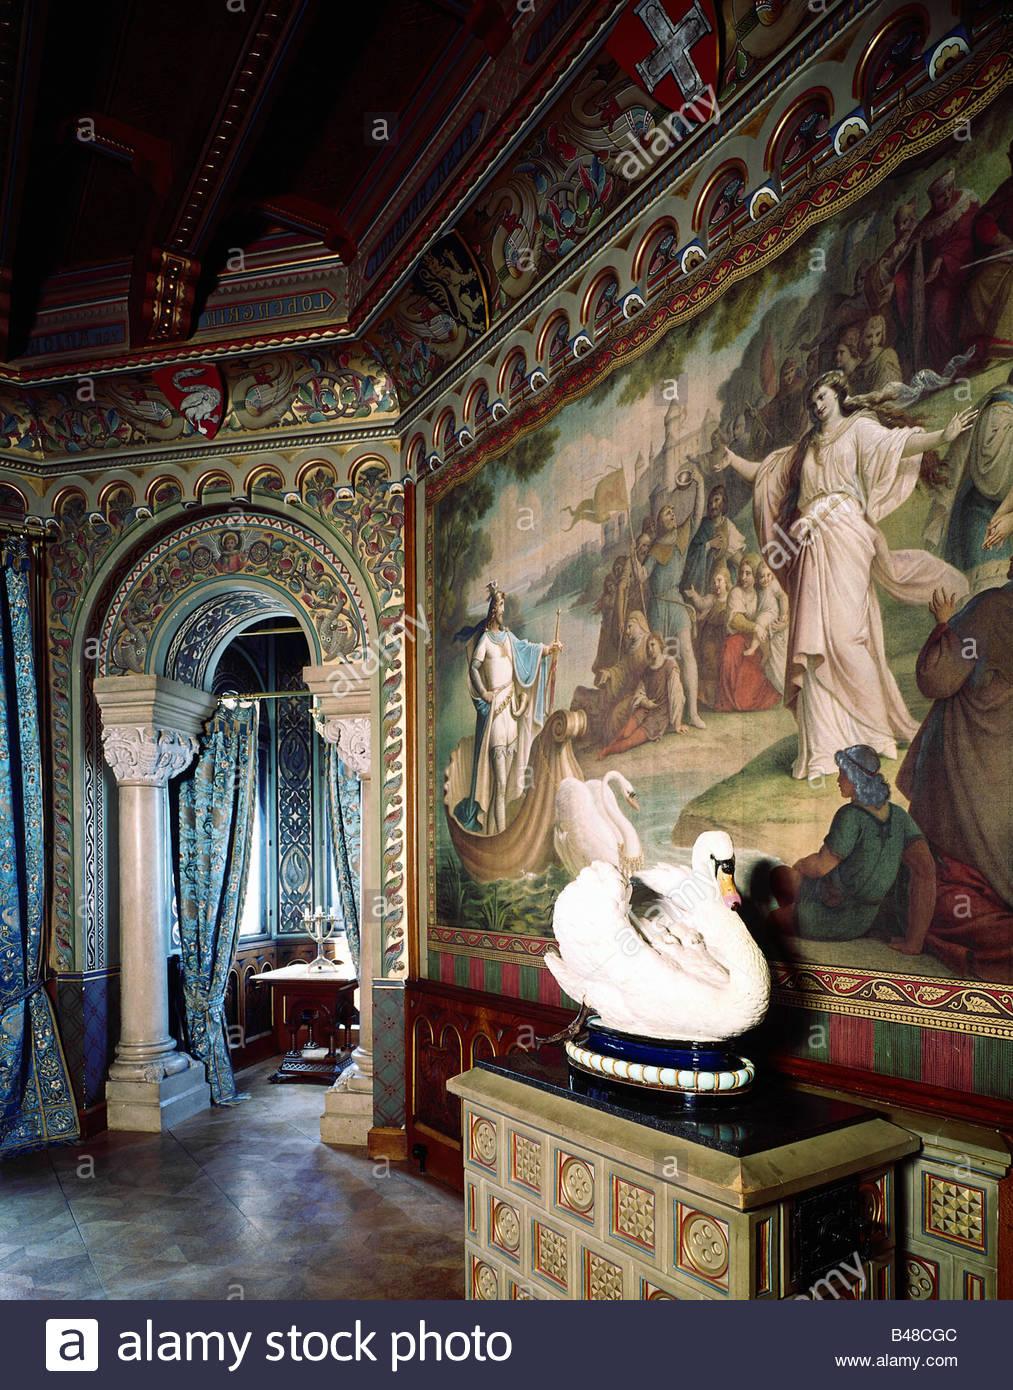 travel and tourism: Neuschwanstein Castle Inside View